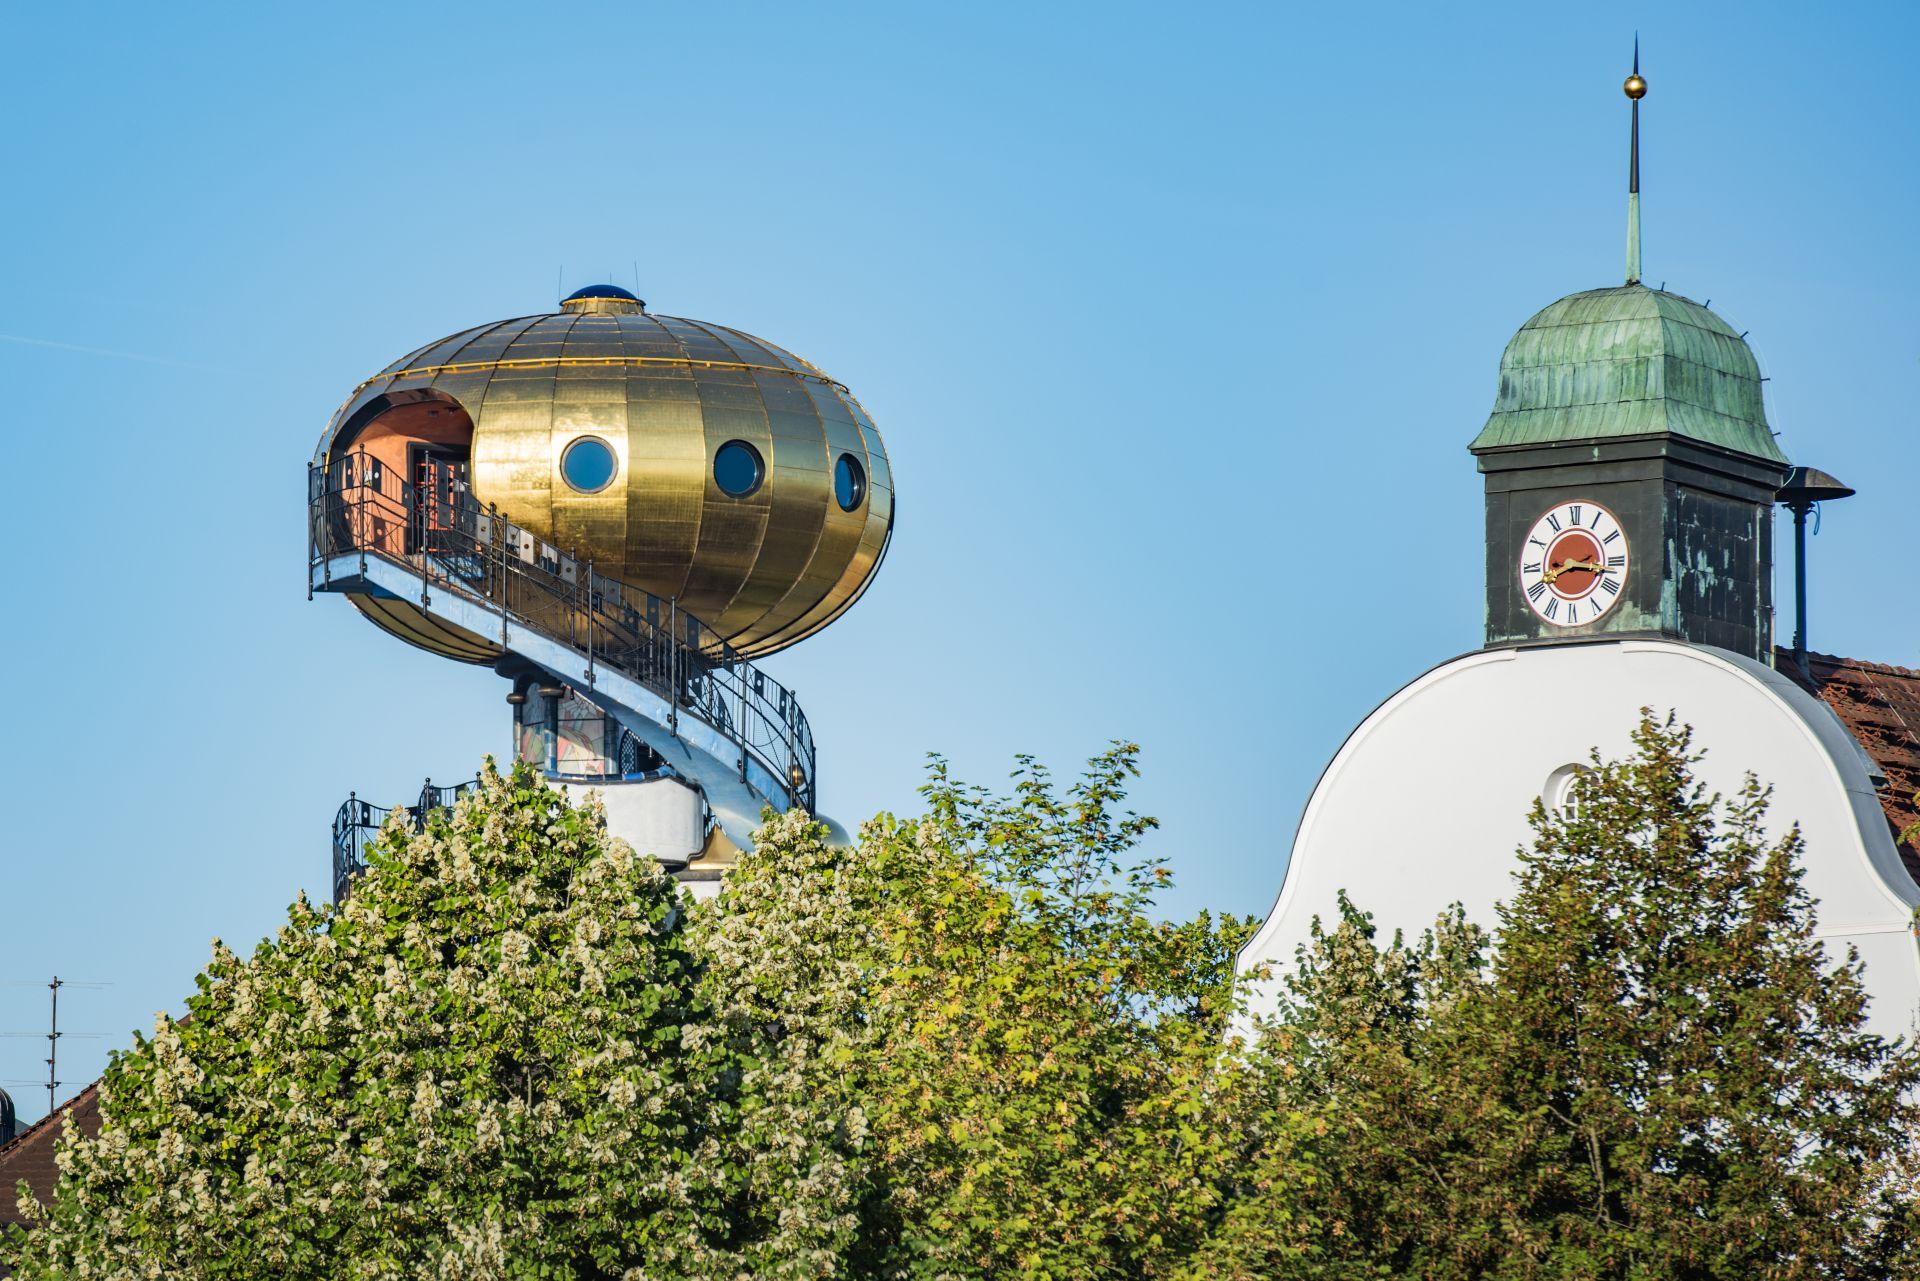 Abensberg mit Kuppel Kuchlbauer Turm